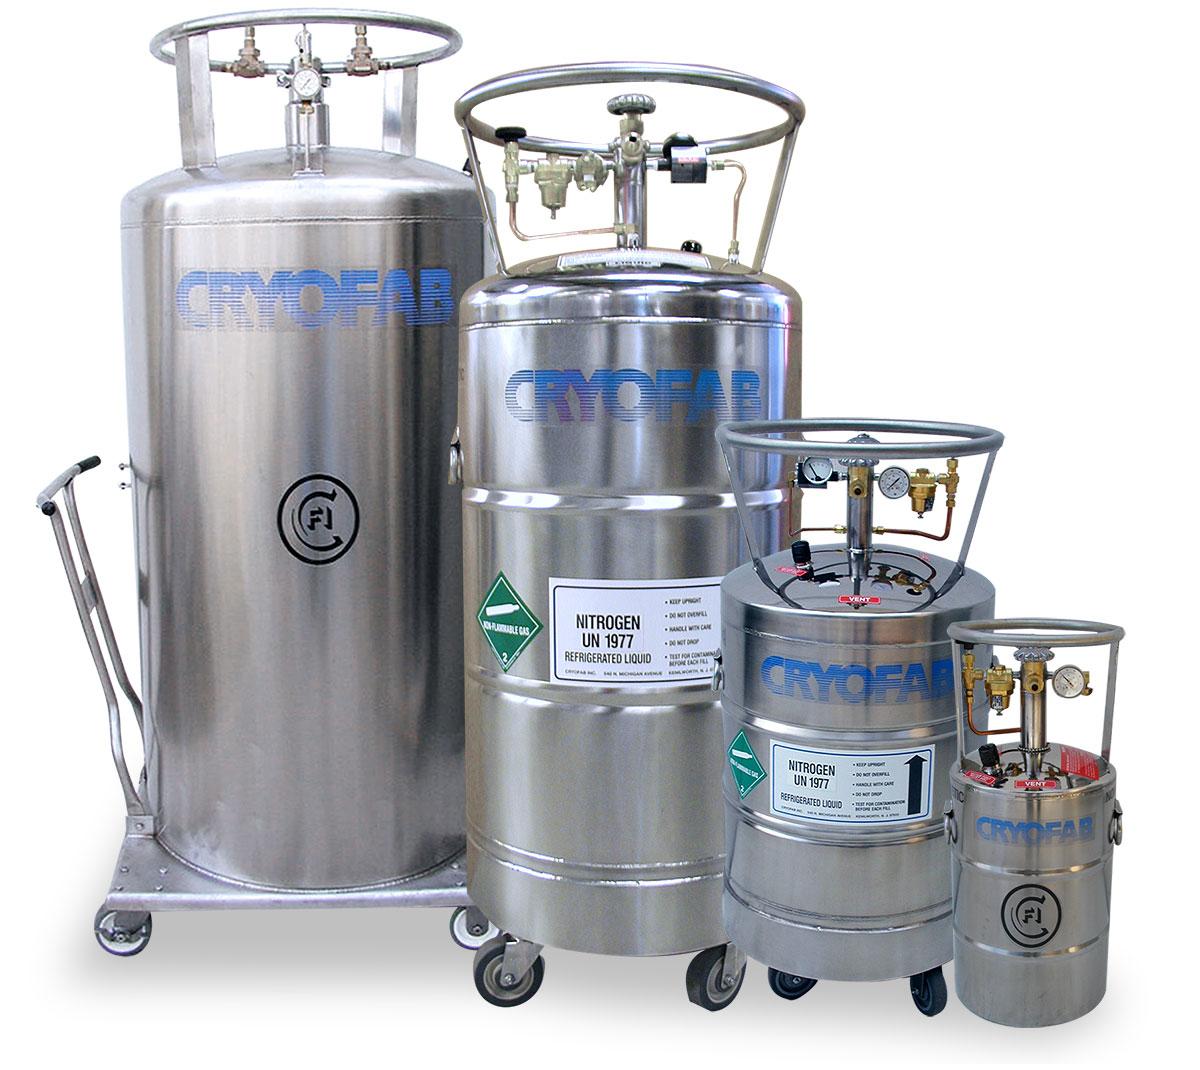 liquid nitrogen (LN2) storage